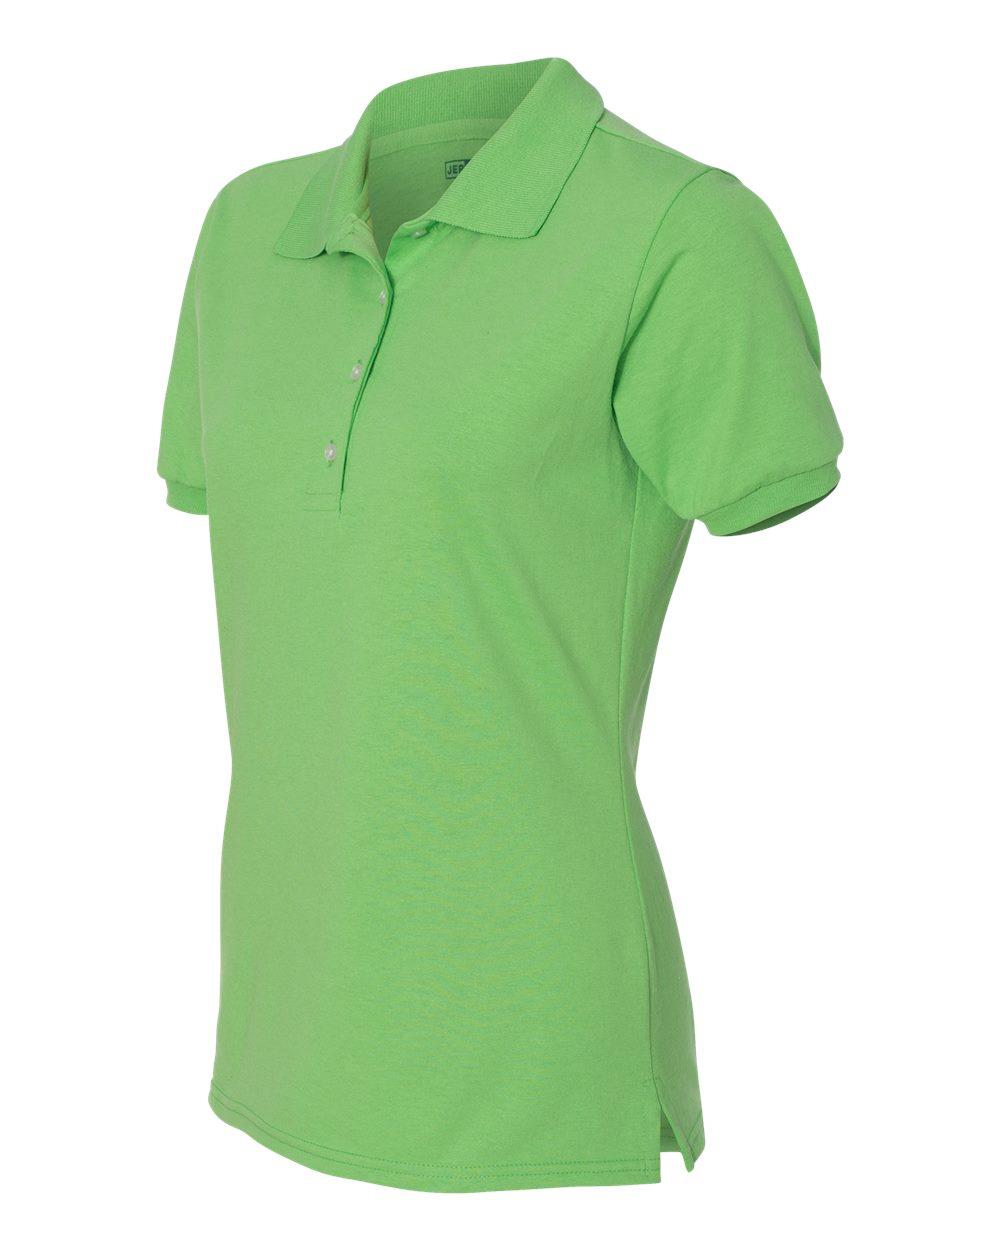 Jerzees-Womens-5-6-oz-50-50-Jersey-Polo-with-Spot-Shield-437W-Size-S-2XL thumbnail 36